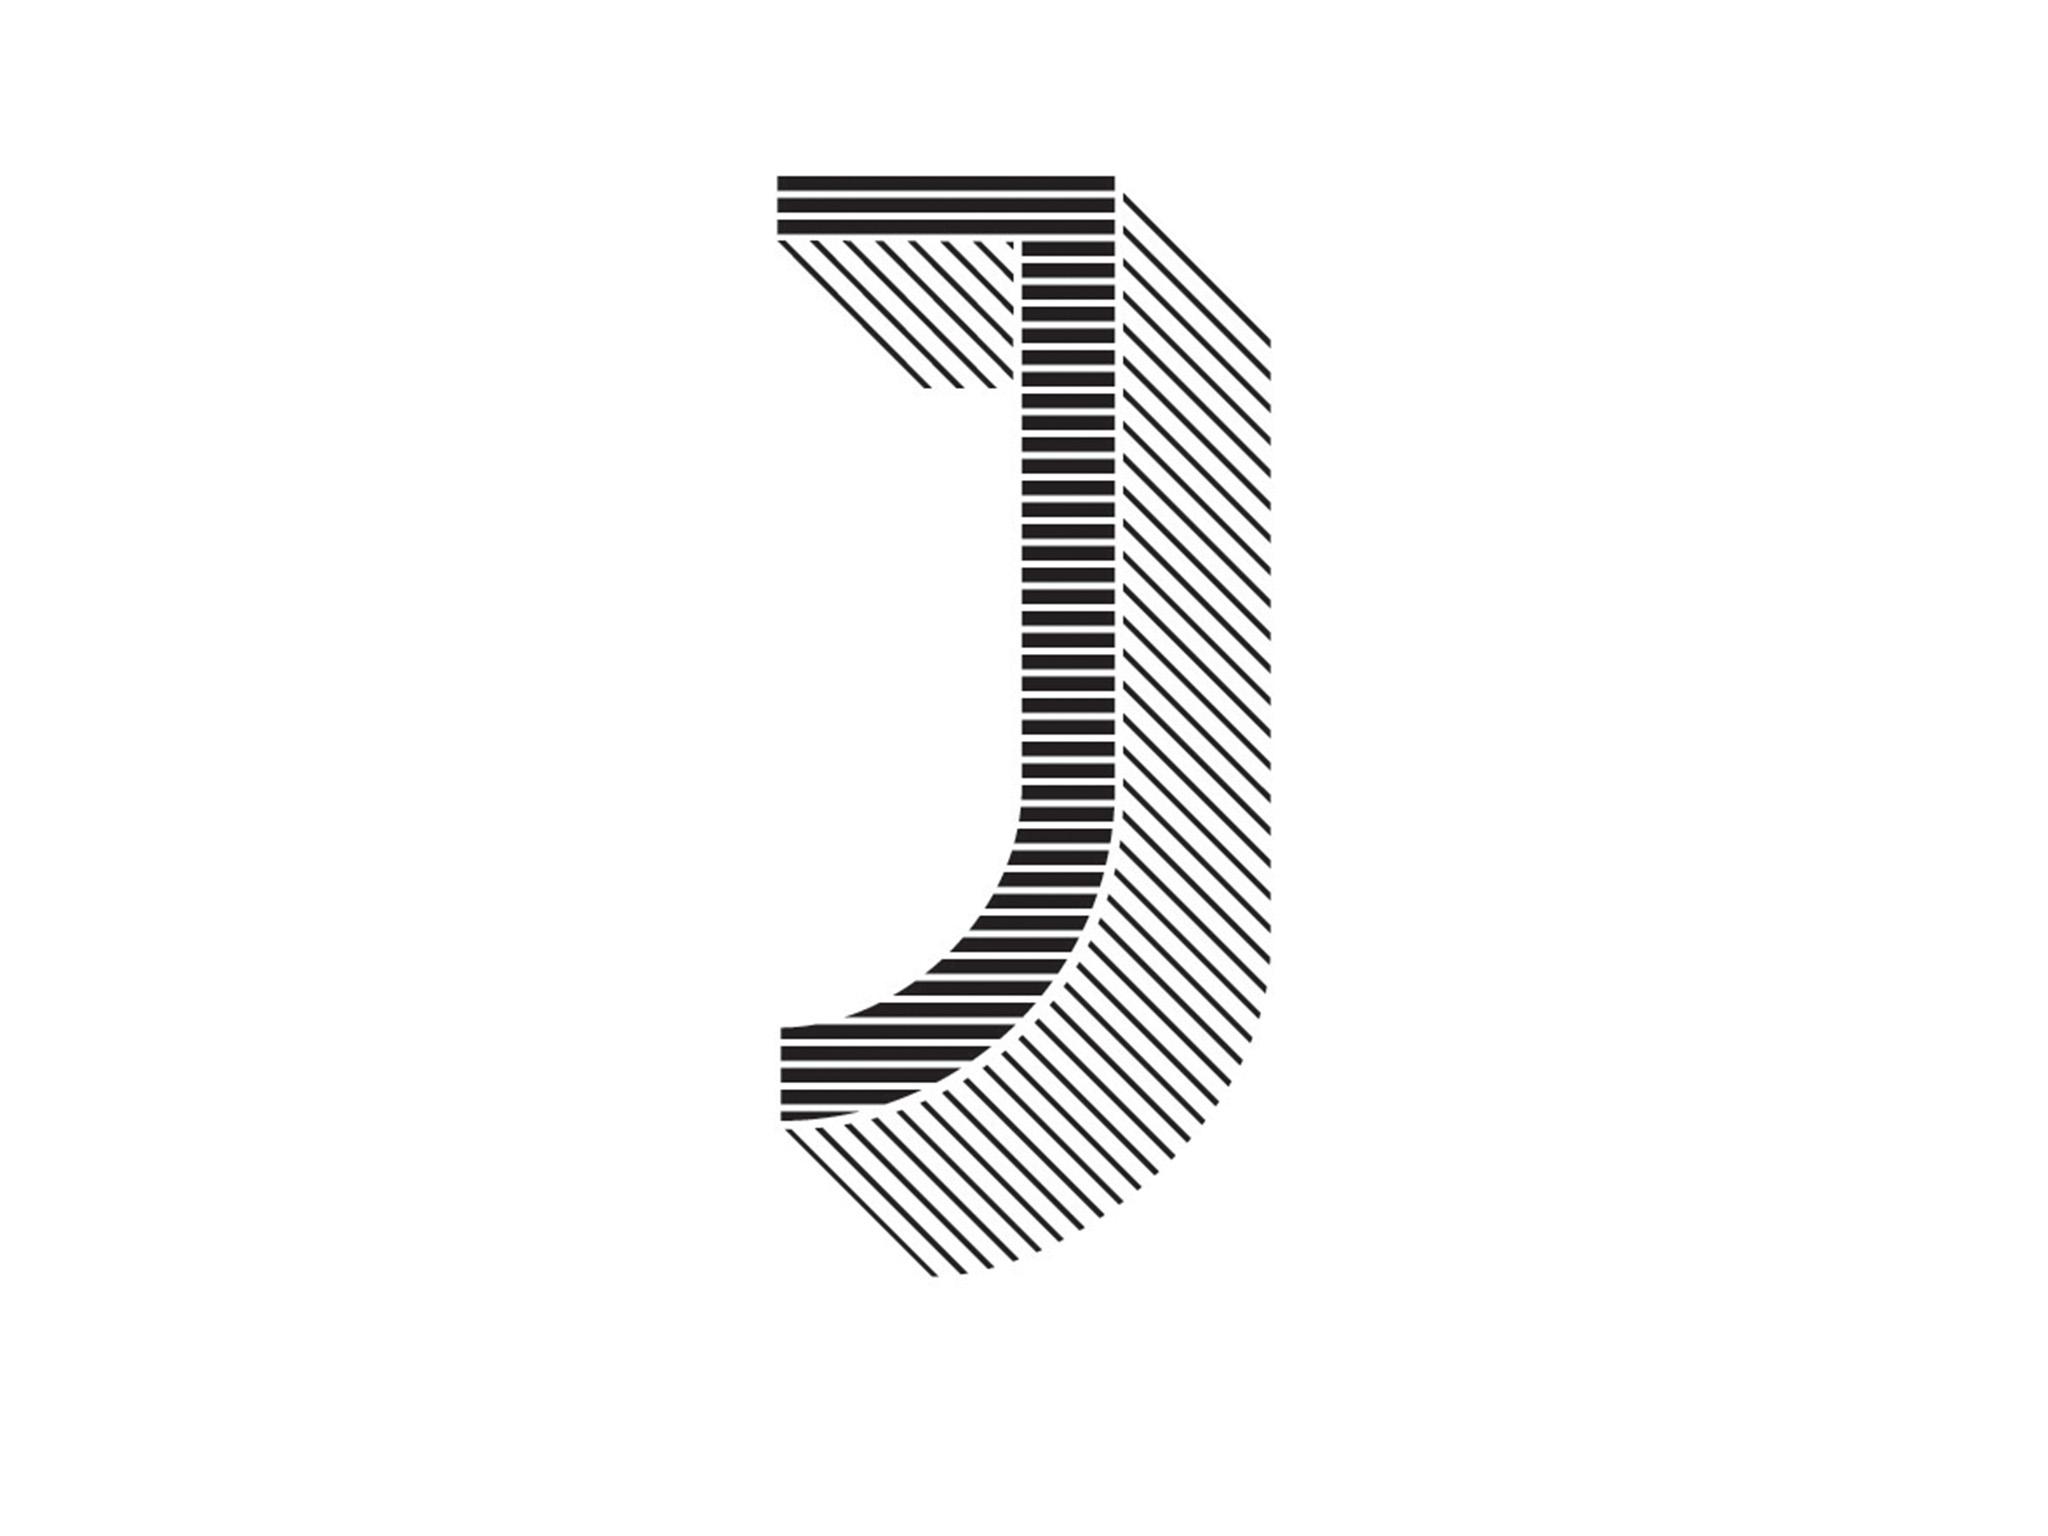 apex_letters_horizontal_large_0012_2_final_alphabet coasters-10.jpg